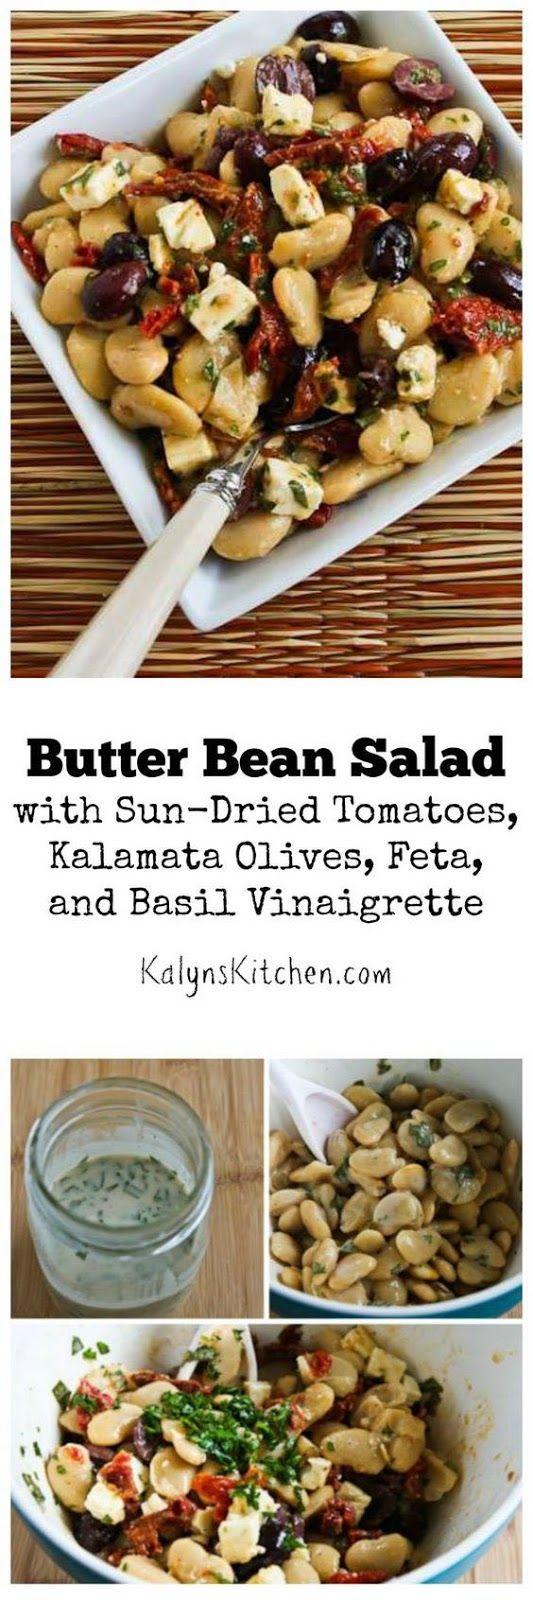 Butter Bean Salad with Sun-Dried Tomatoes, Kalamata Olives, Feta, and Basil Vinaigrette found on KalynsKitchen.com.